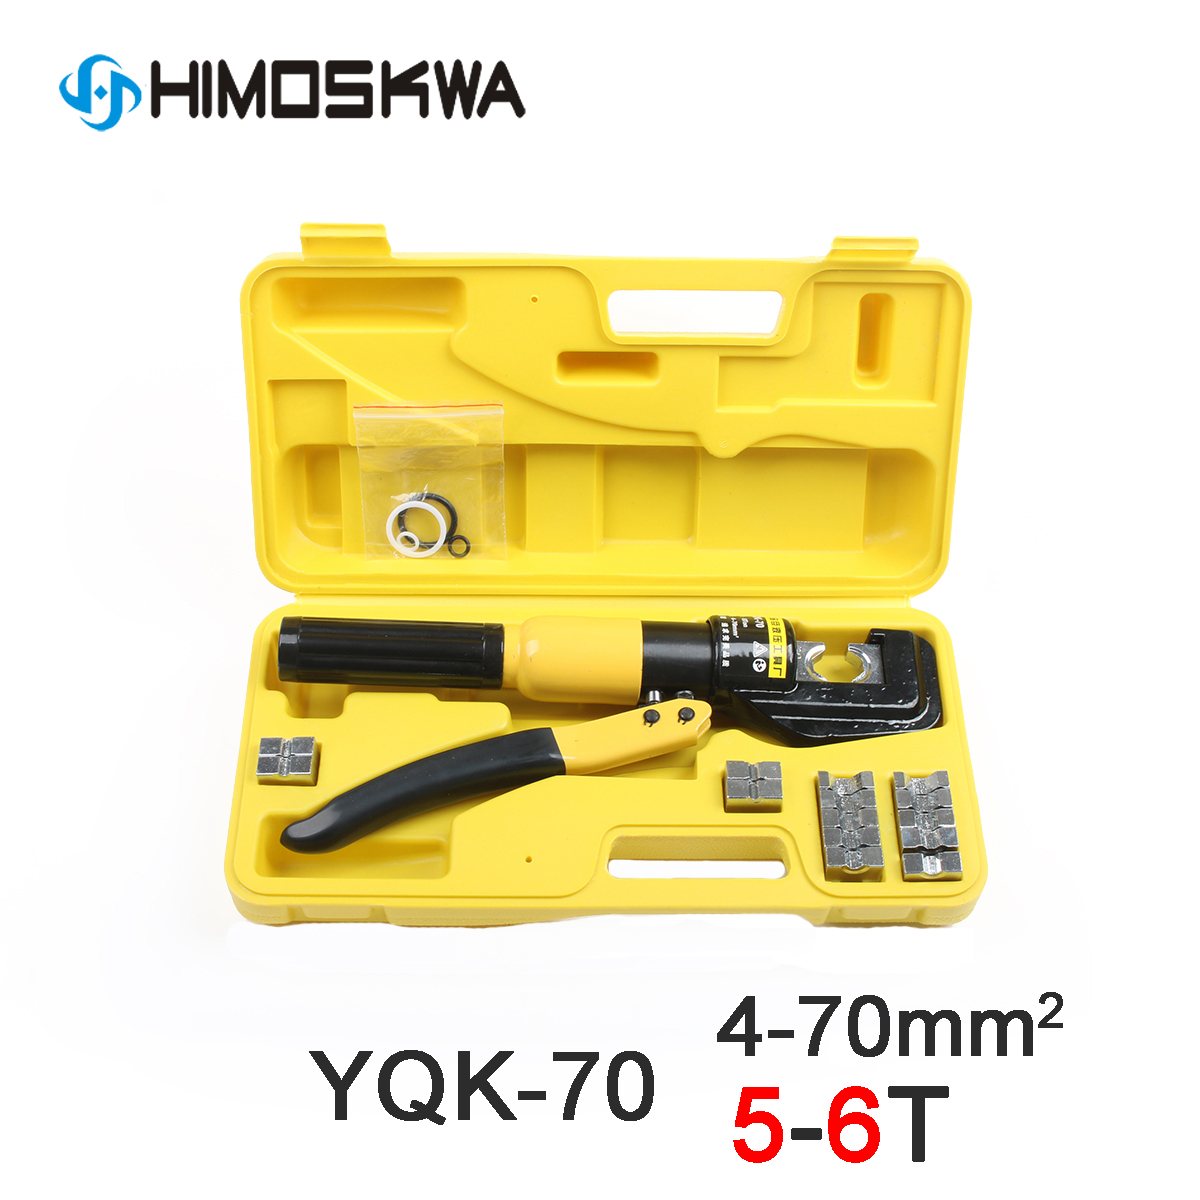 5-6T Cable lug Hydraulic Crimping Tool Hydraulic Crimping Plier Hydraulic Compression Tool YQK-70 Range 4-70MM2 Pressure